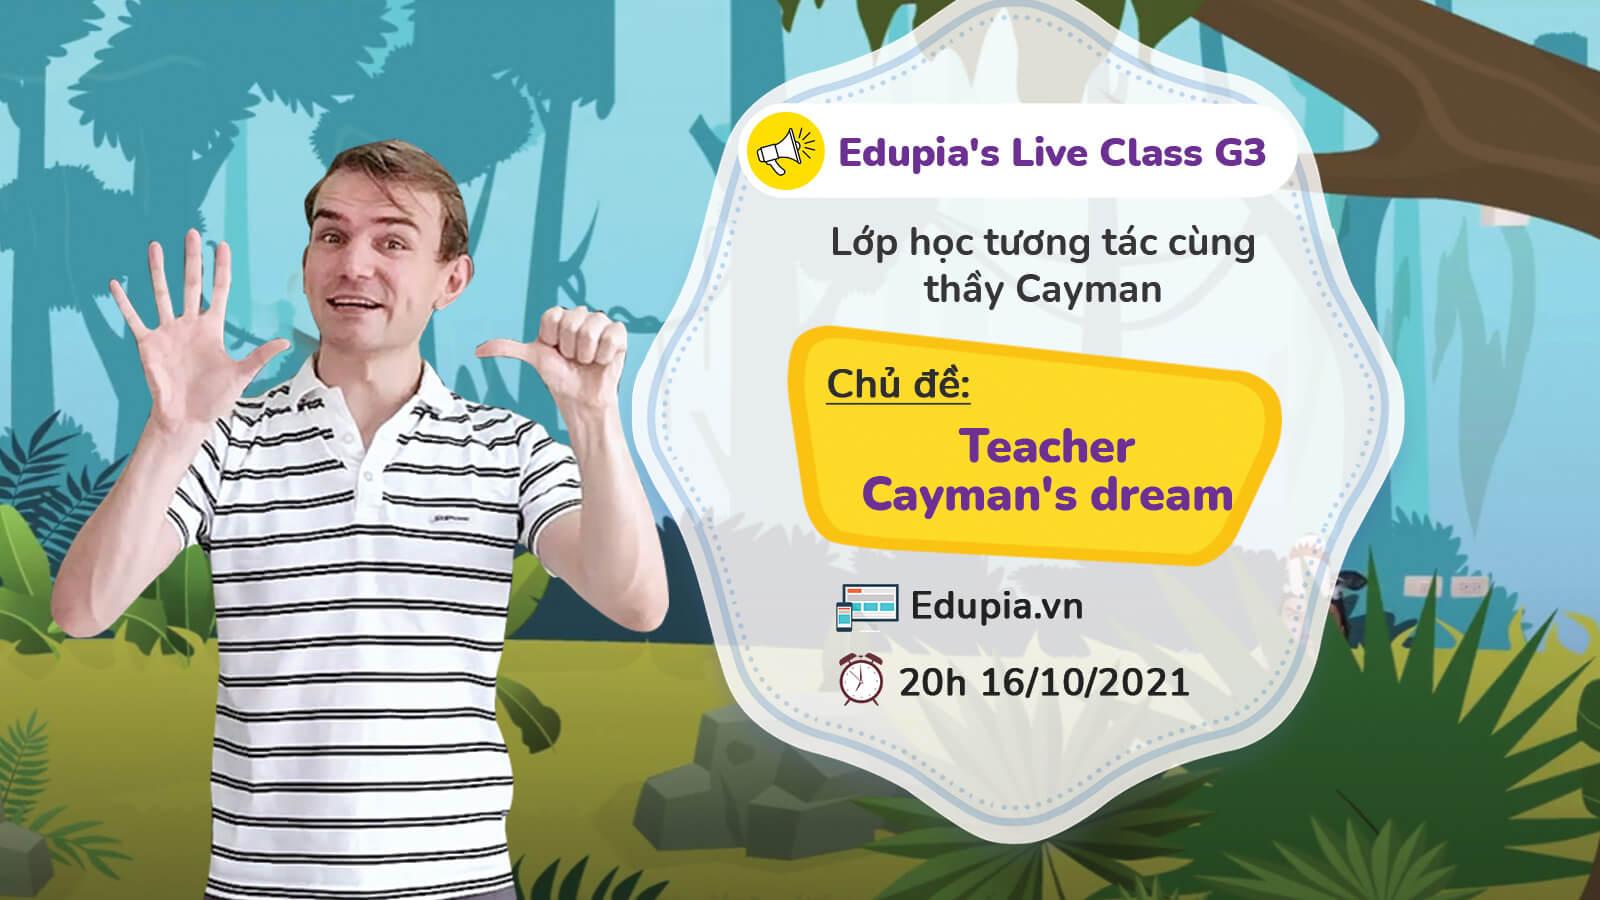 Teacher Cayman's dream